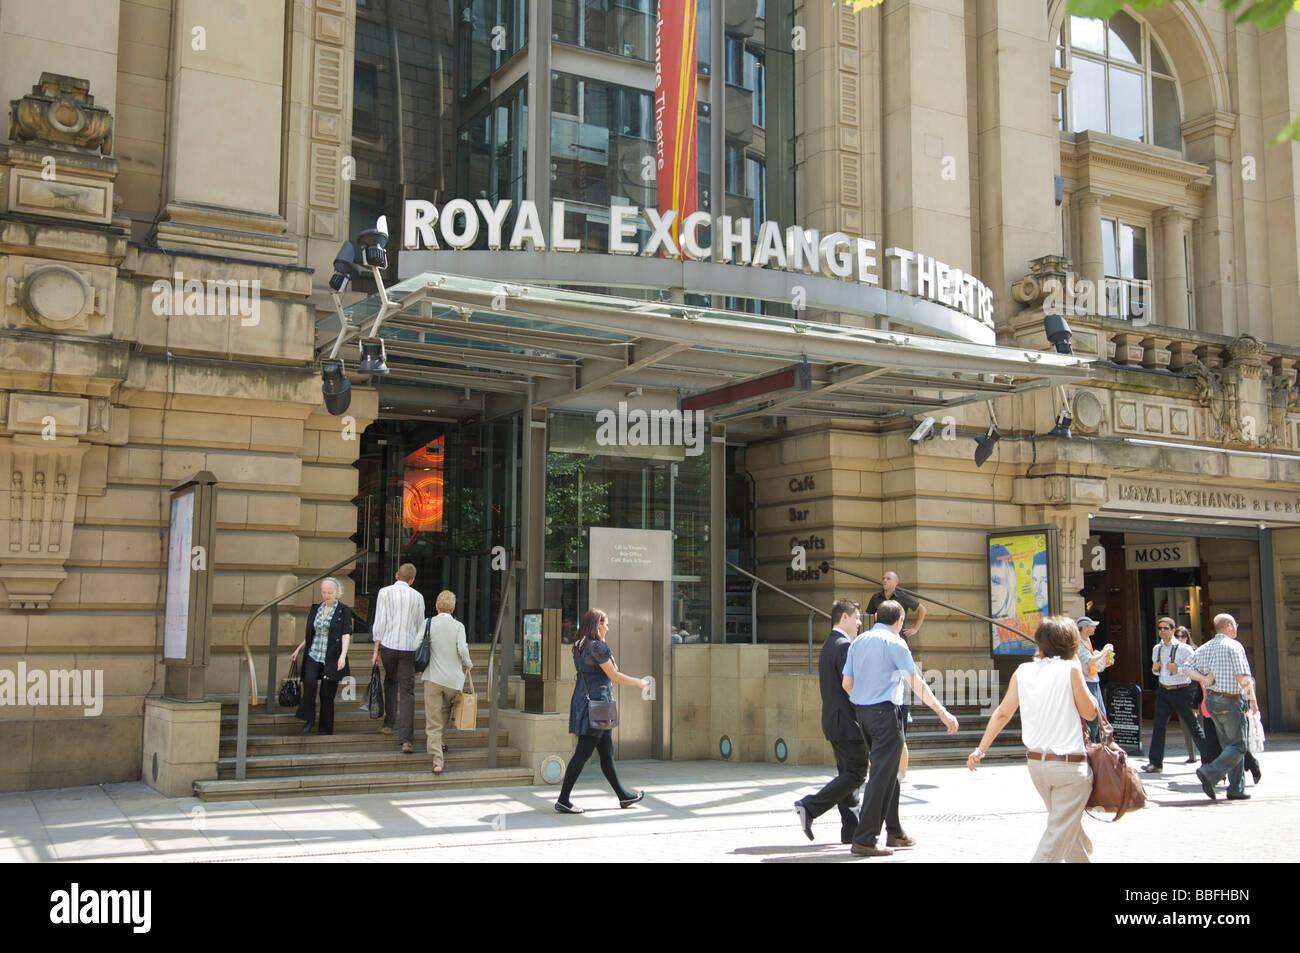 Esterno del Royal Exchange Theatre in St Anns Square, Manchester Foto Stock